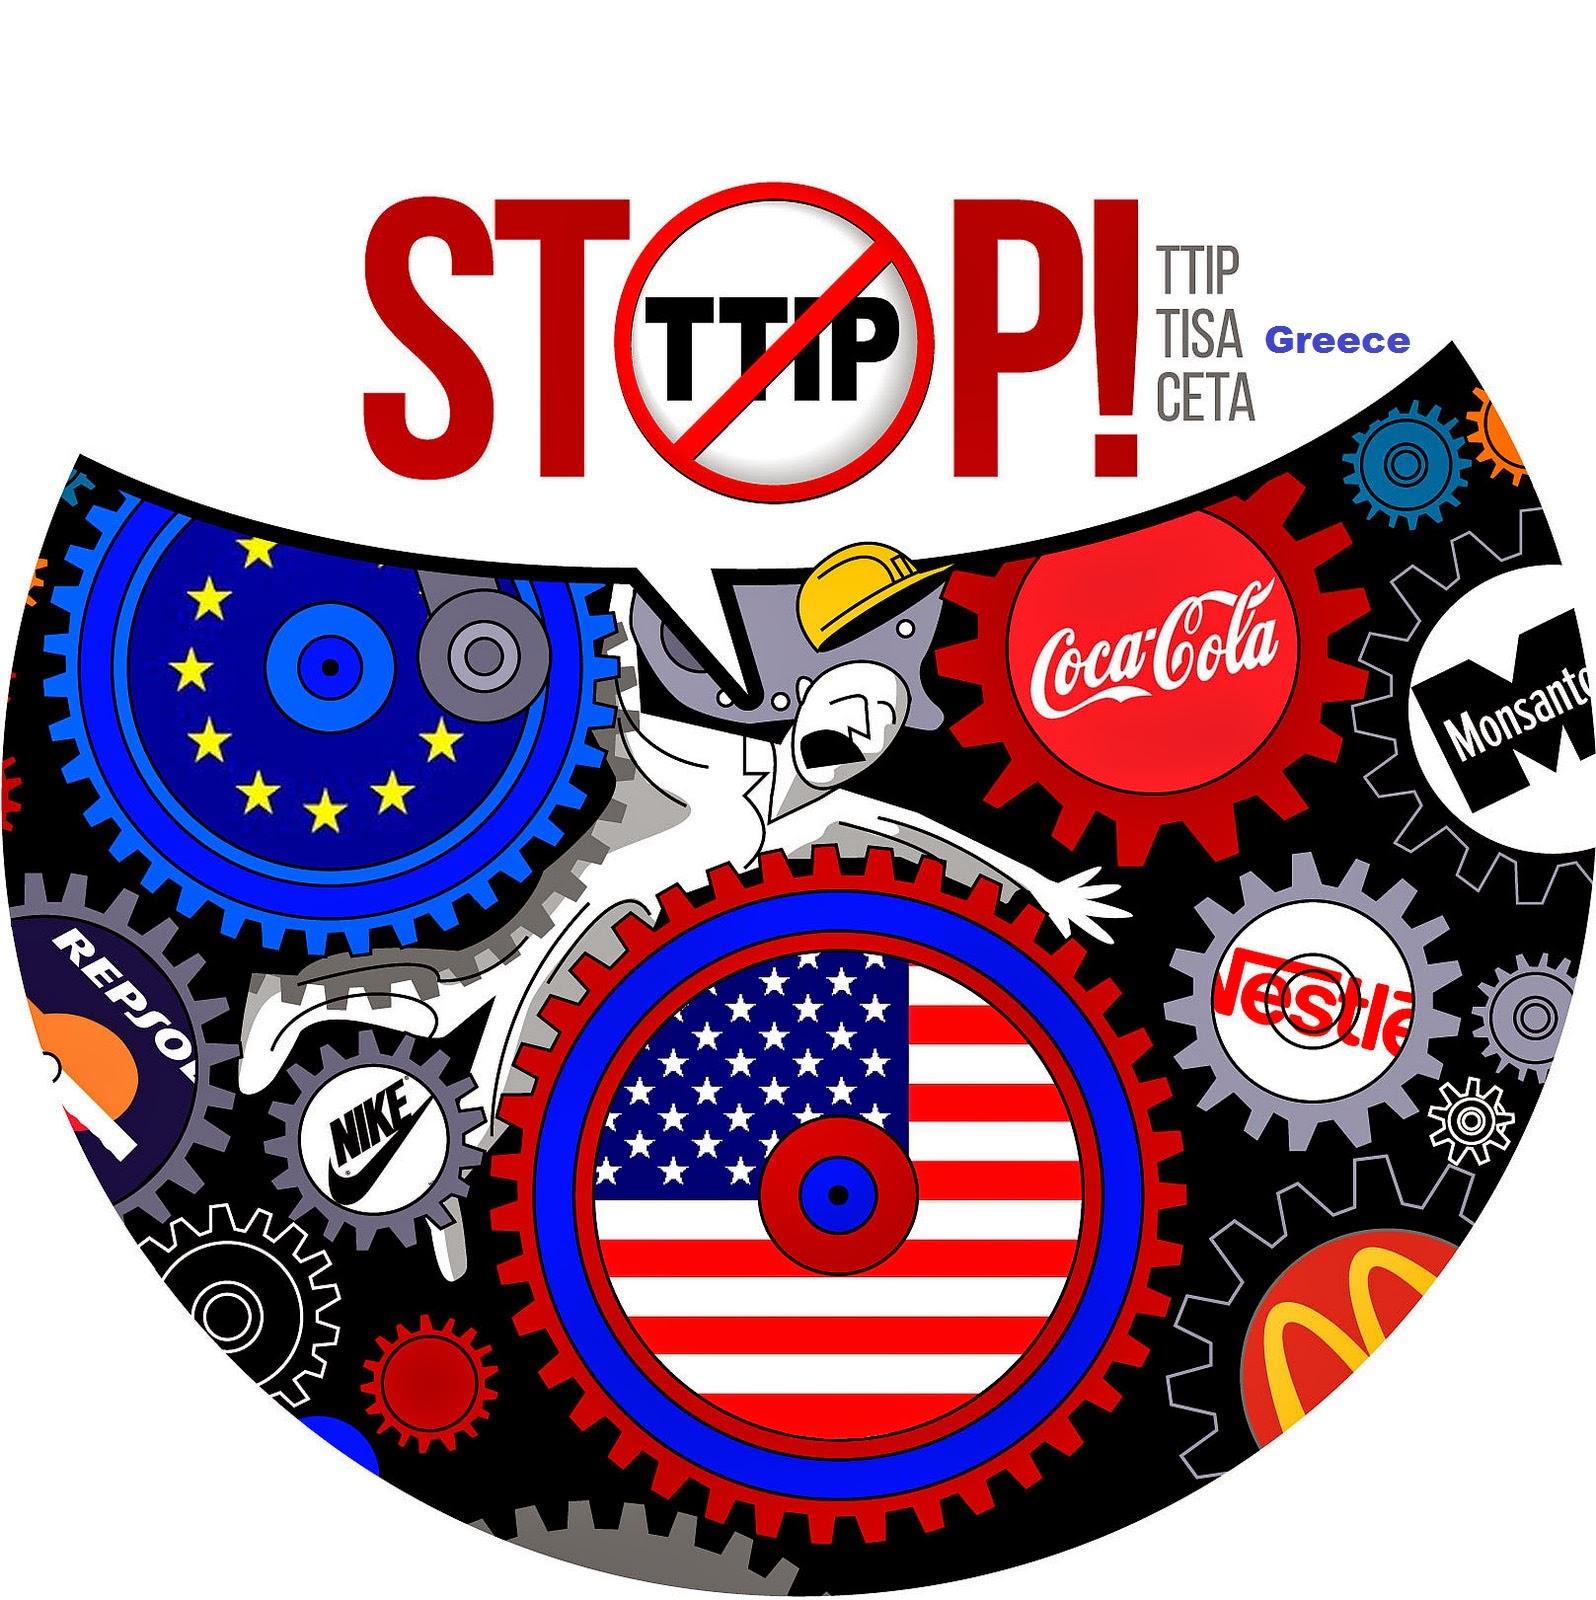 STOP TTIP CETA TISA Παγκόσμια ημέρα δράσης 18/4/2015